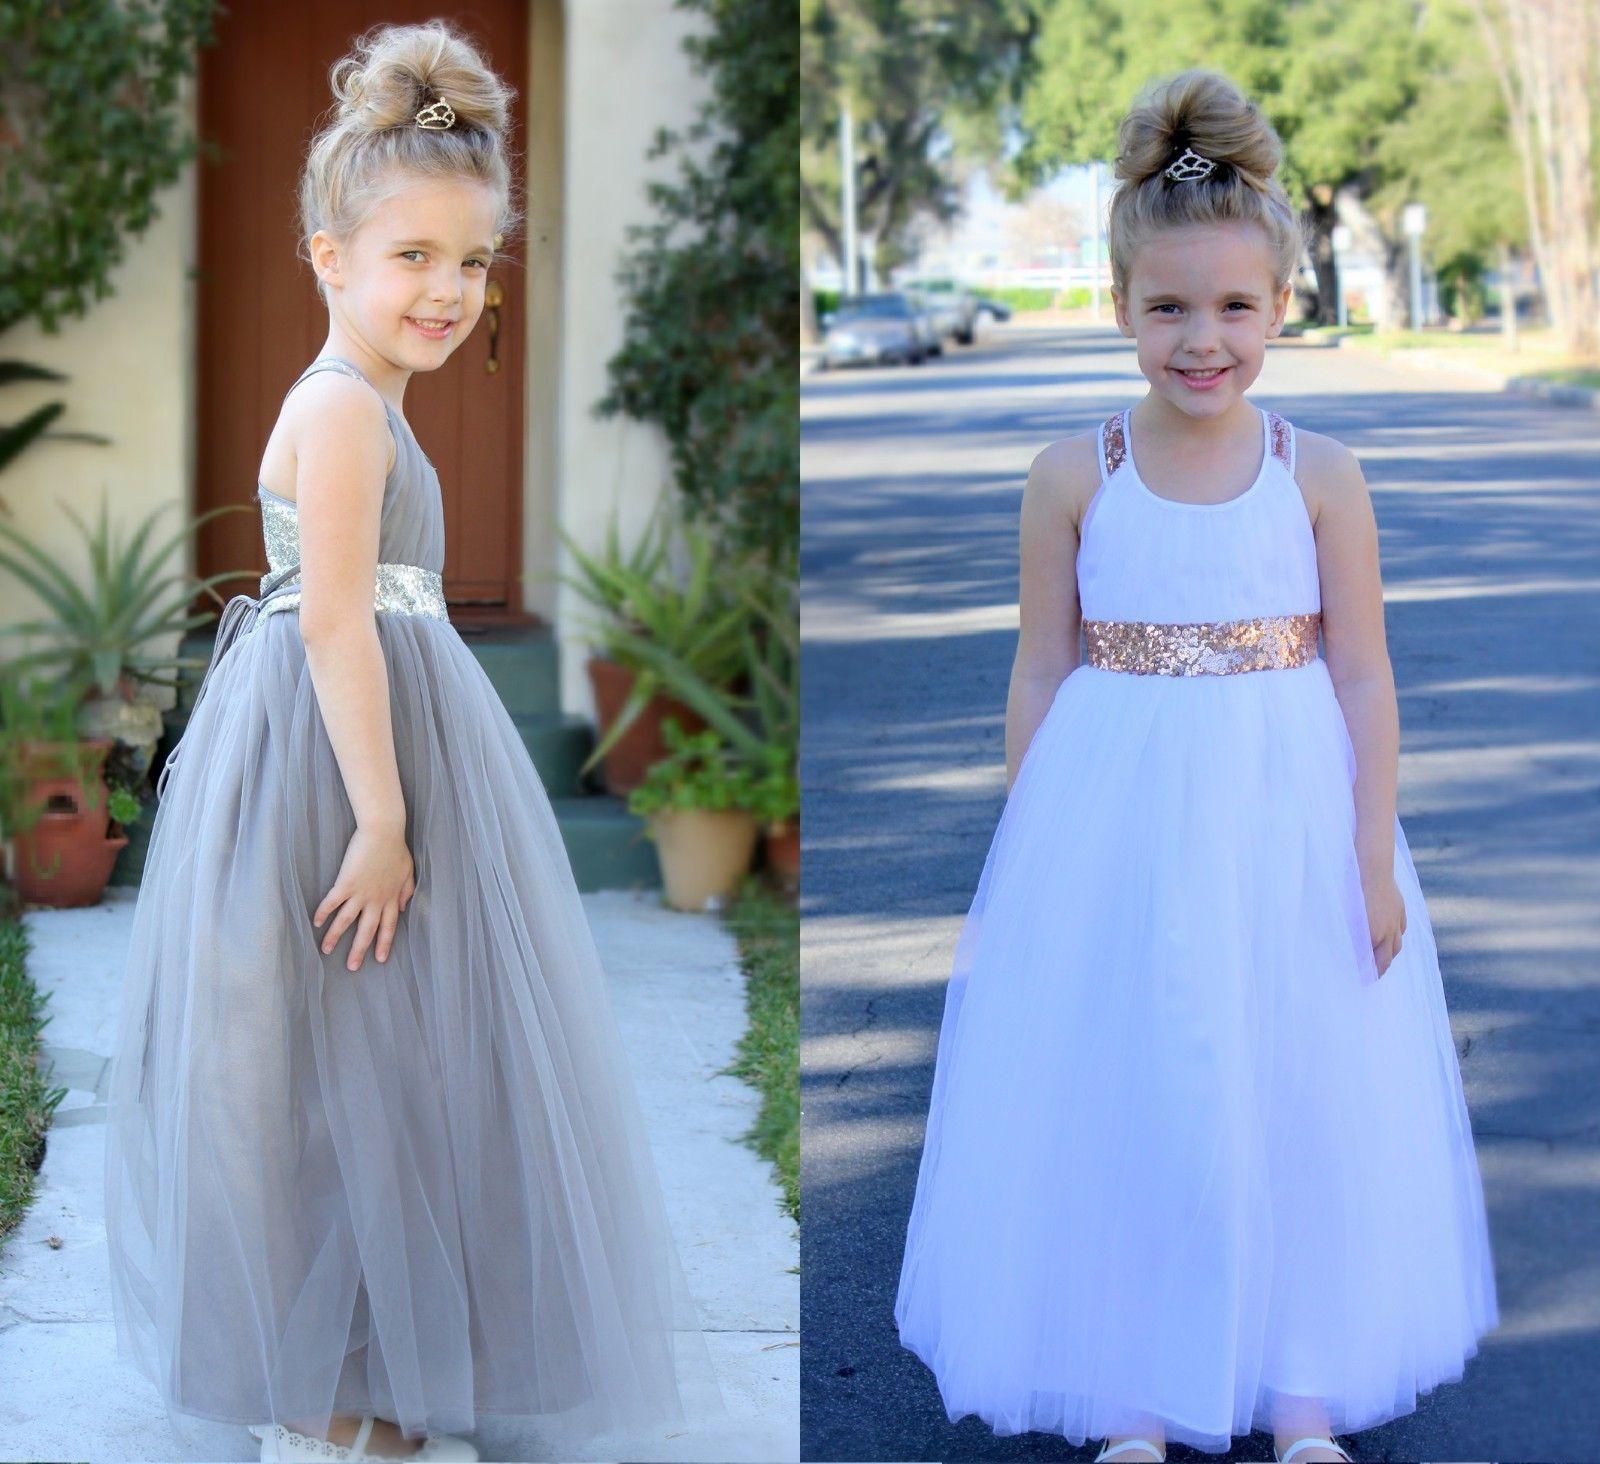 Flower Girl Princess Dress Party Dance Wedding Birthday Prom Graduation Recital